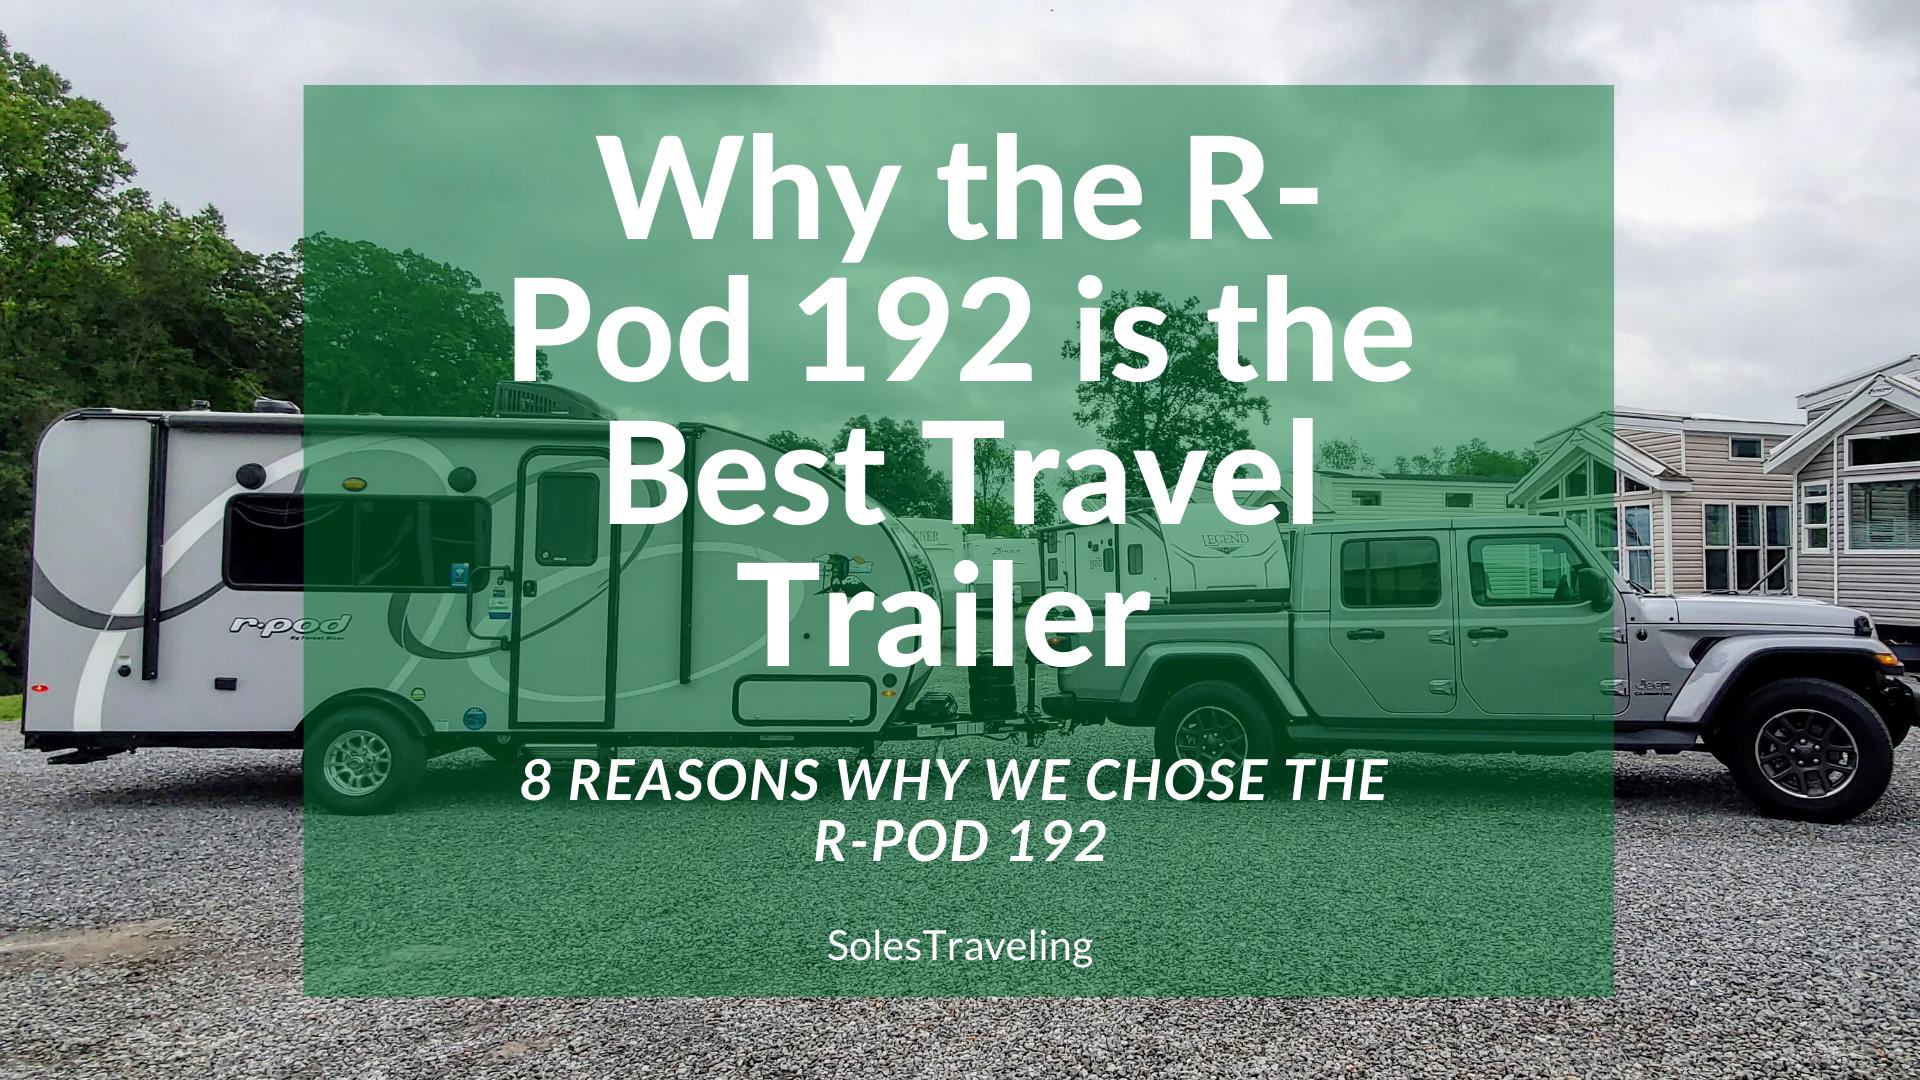 r-pod 192 best travel trailer